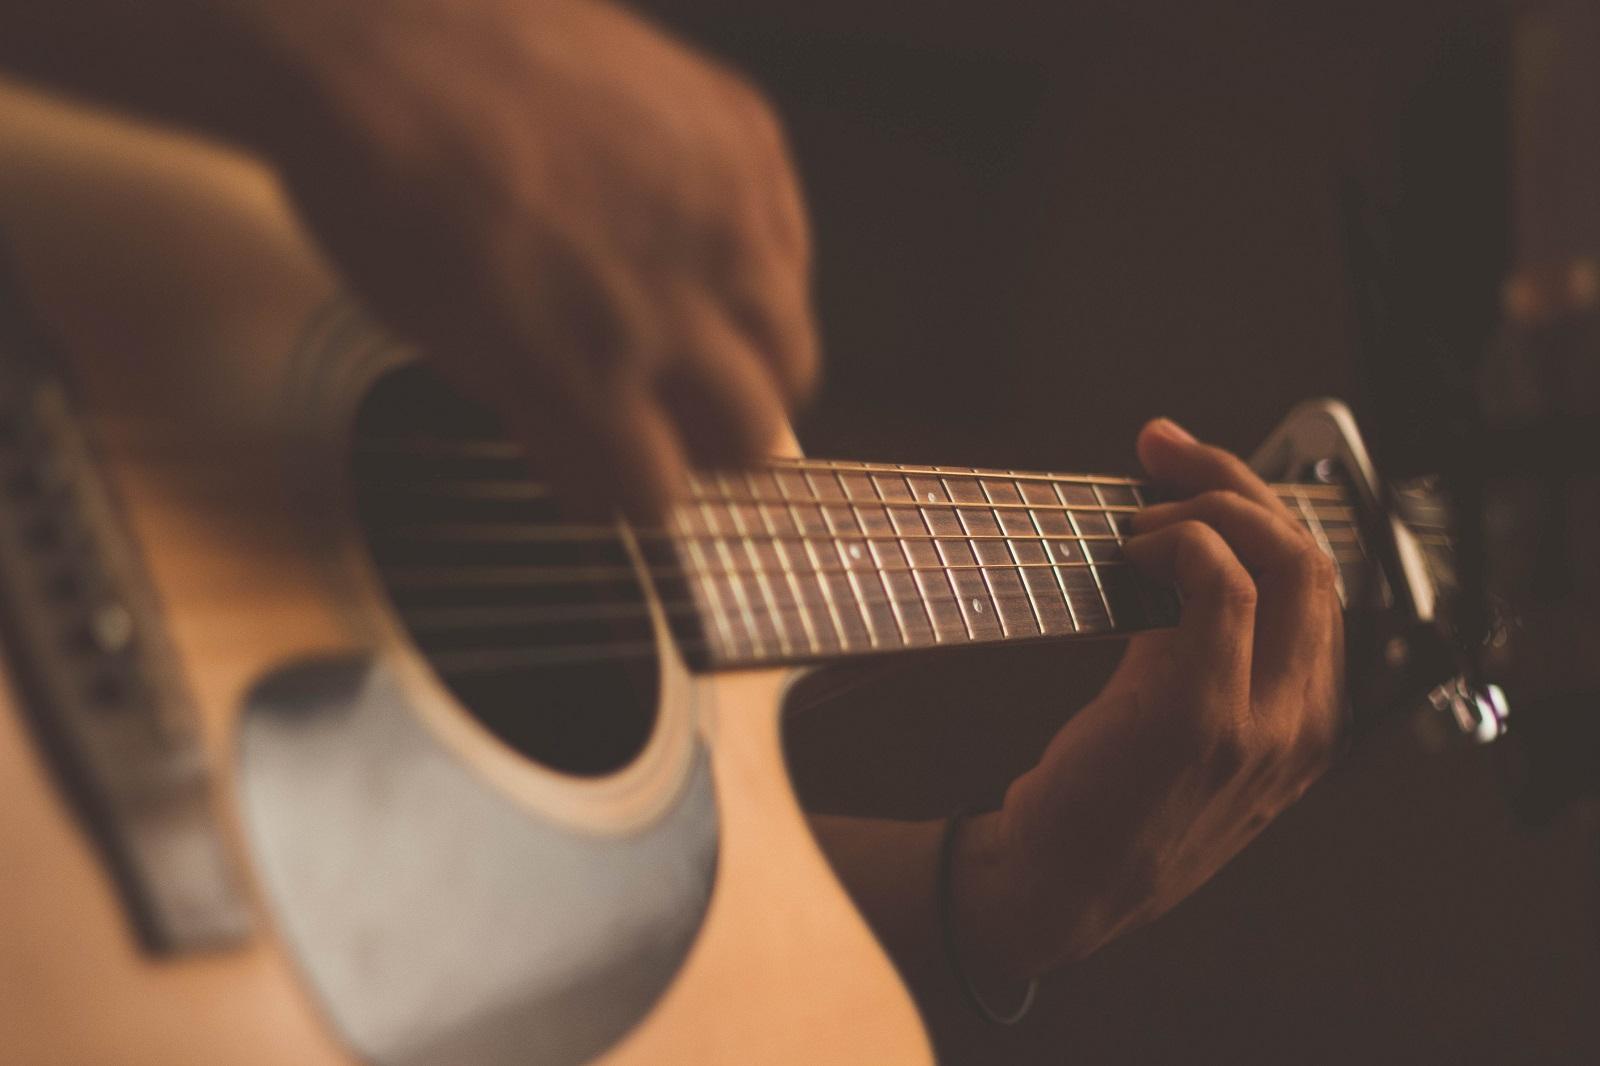 http://www.lakeshorecountryclub.com/uploads/slides/139605_acoustic-guitar.jpg